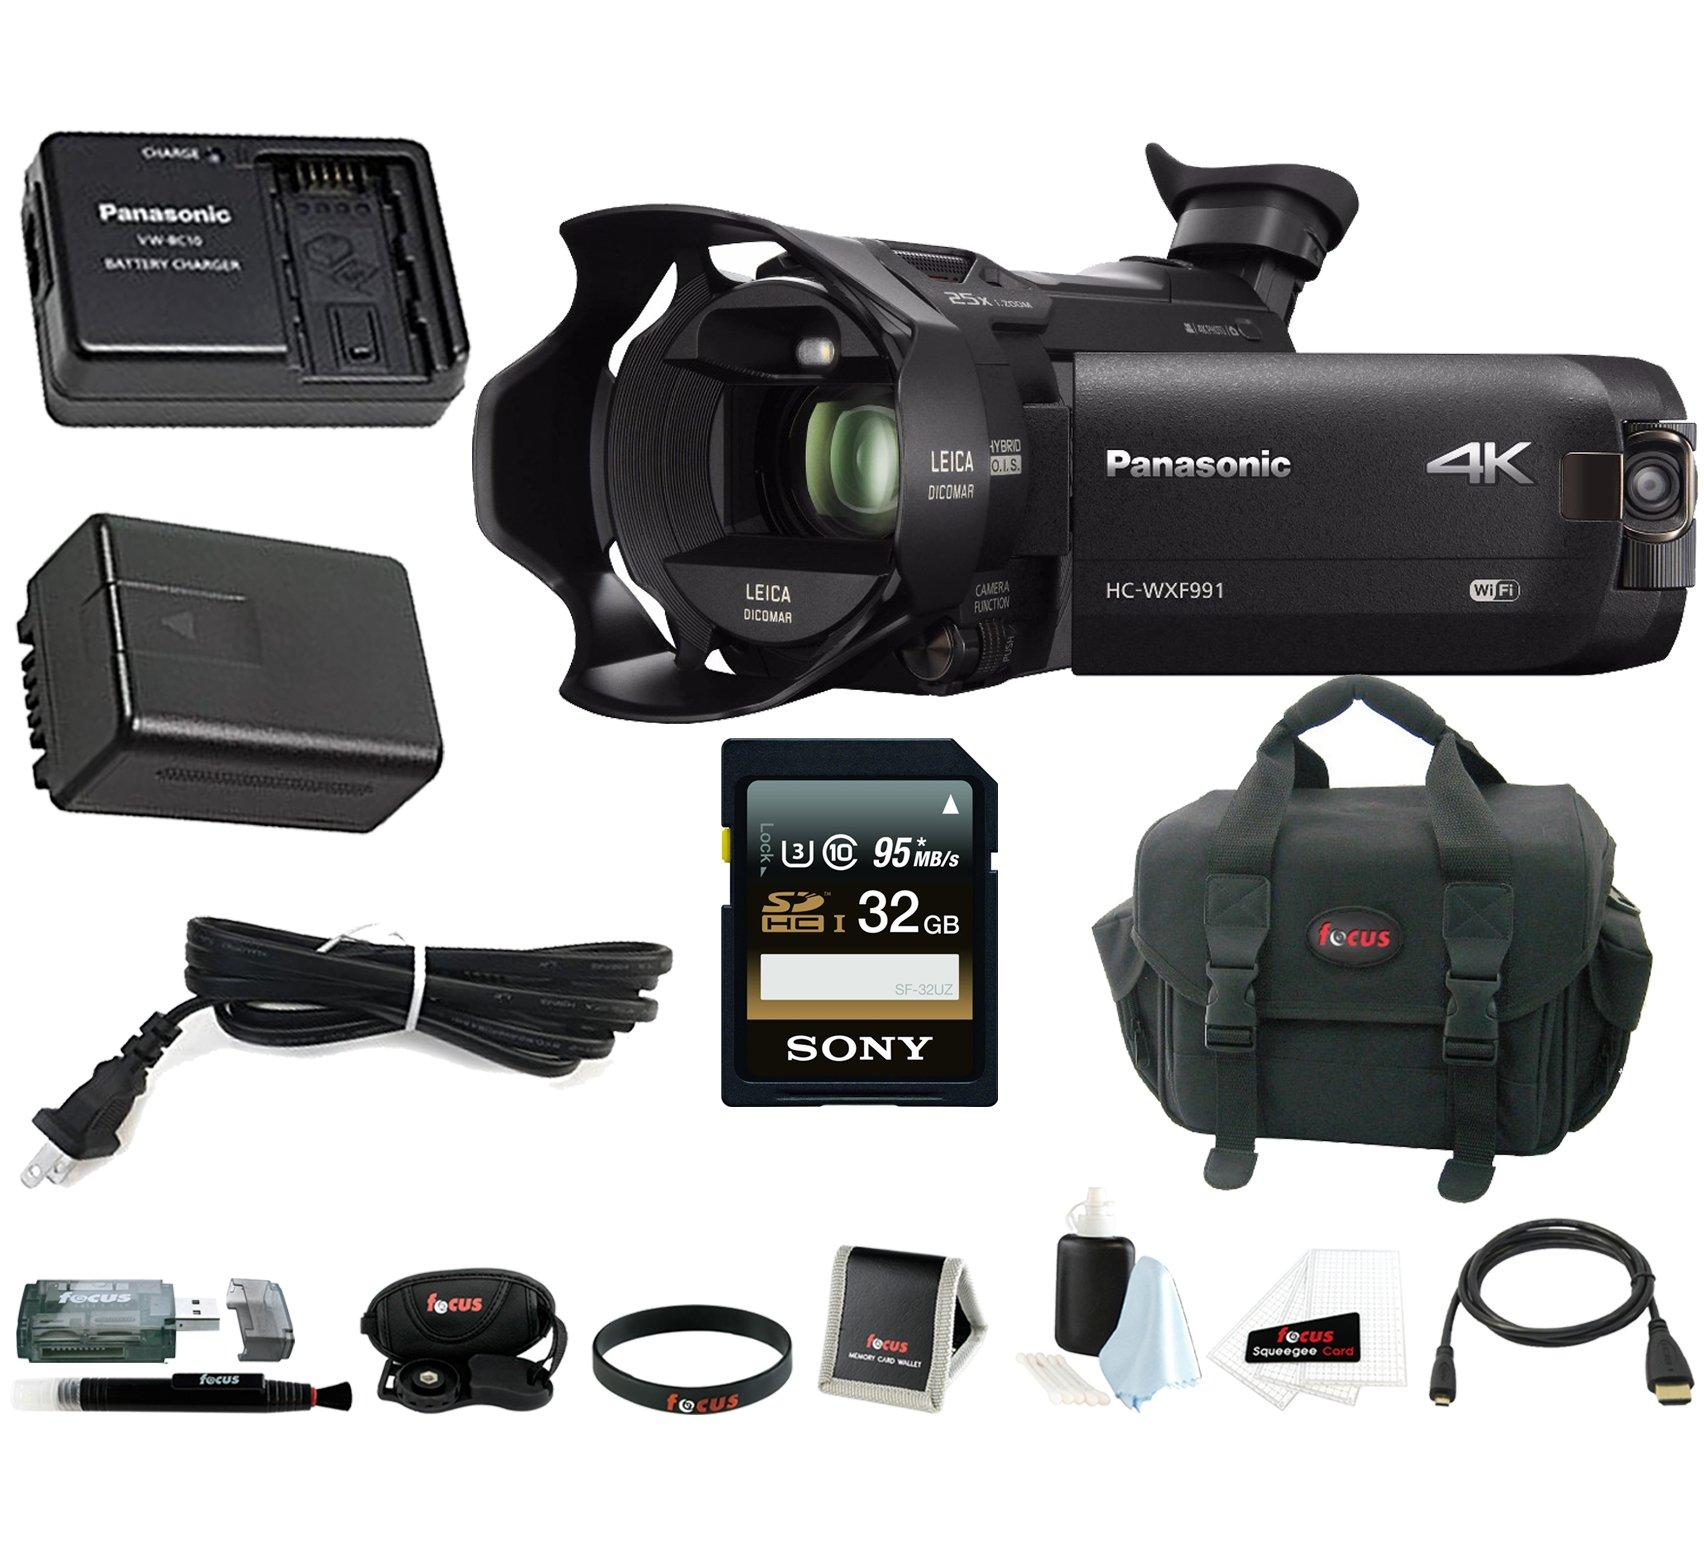 Panasonic HC-WXF991K 4K Ultra HD Camcorder with Twin Camera, Panasonic Power Pack (VW-PWPK) + 32GB Acc Kit by Panasonic